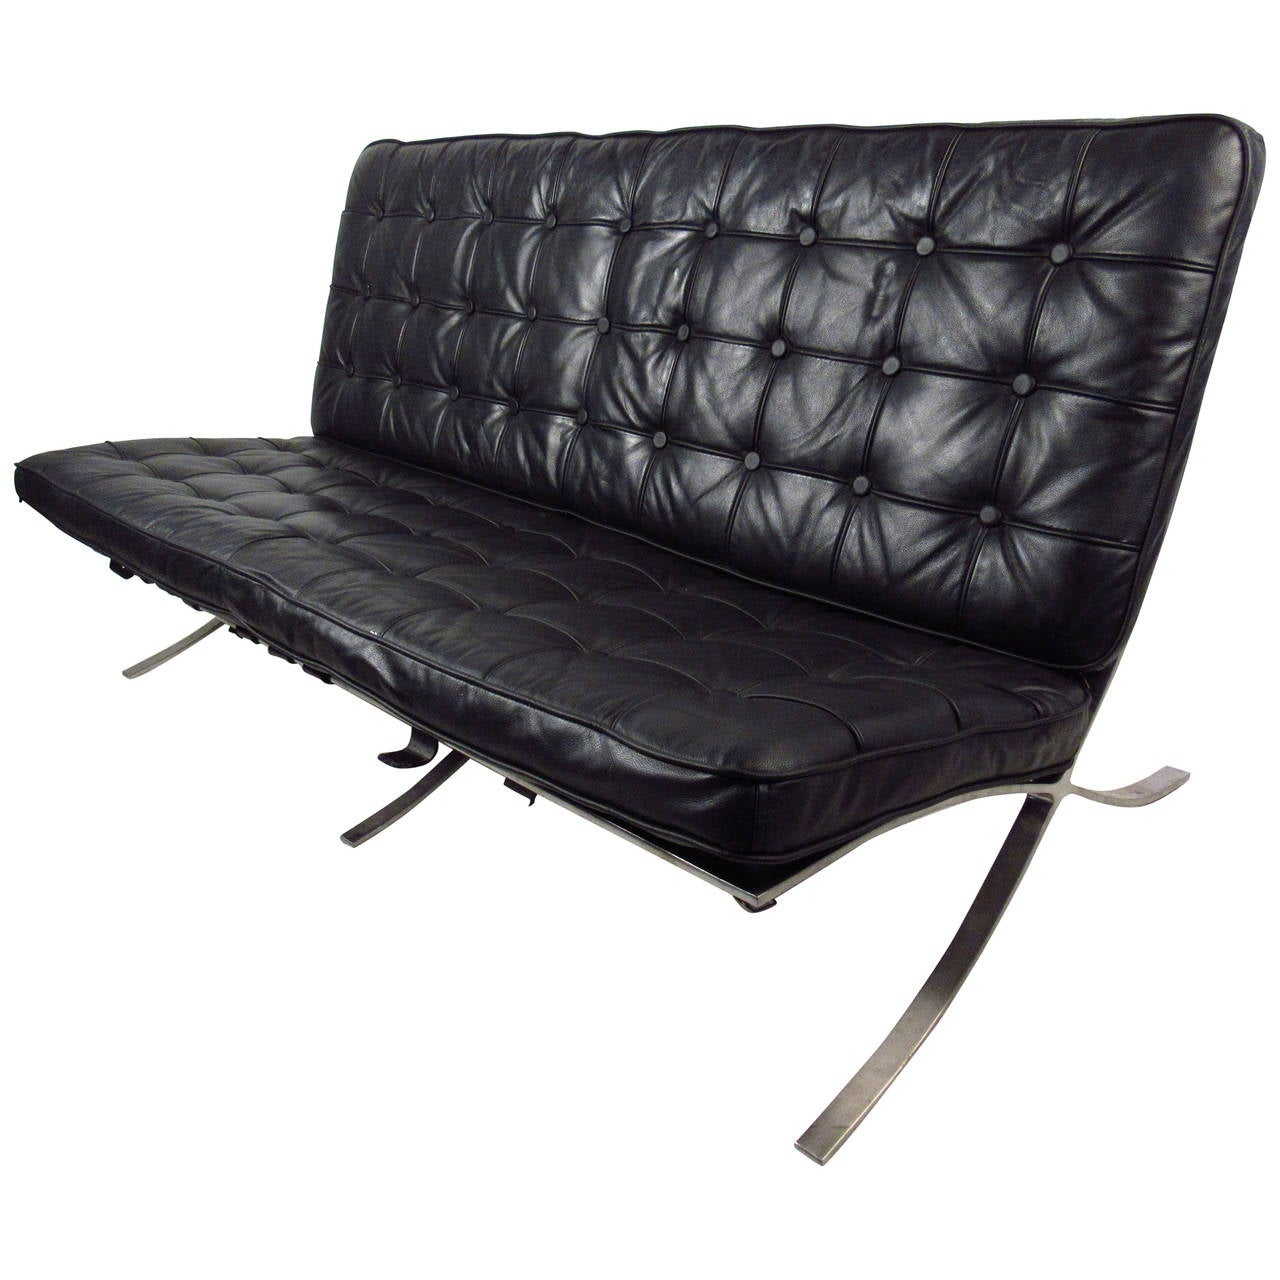 Mid century style barcelona sofa ludwig mies van der rohe for Sofas 4 plazas barcelona